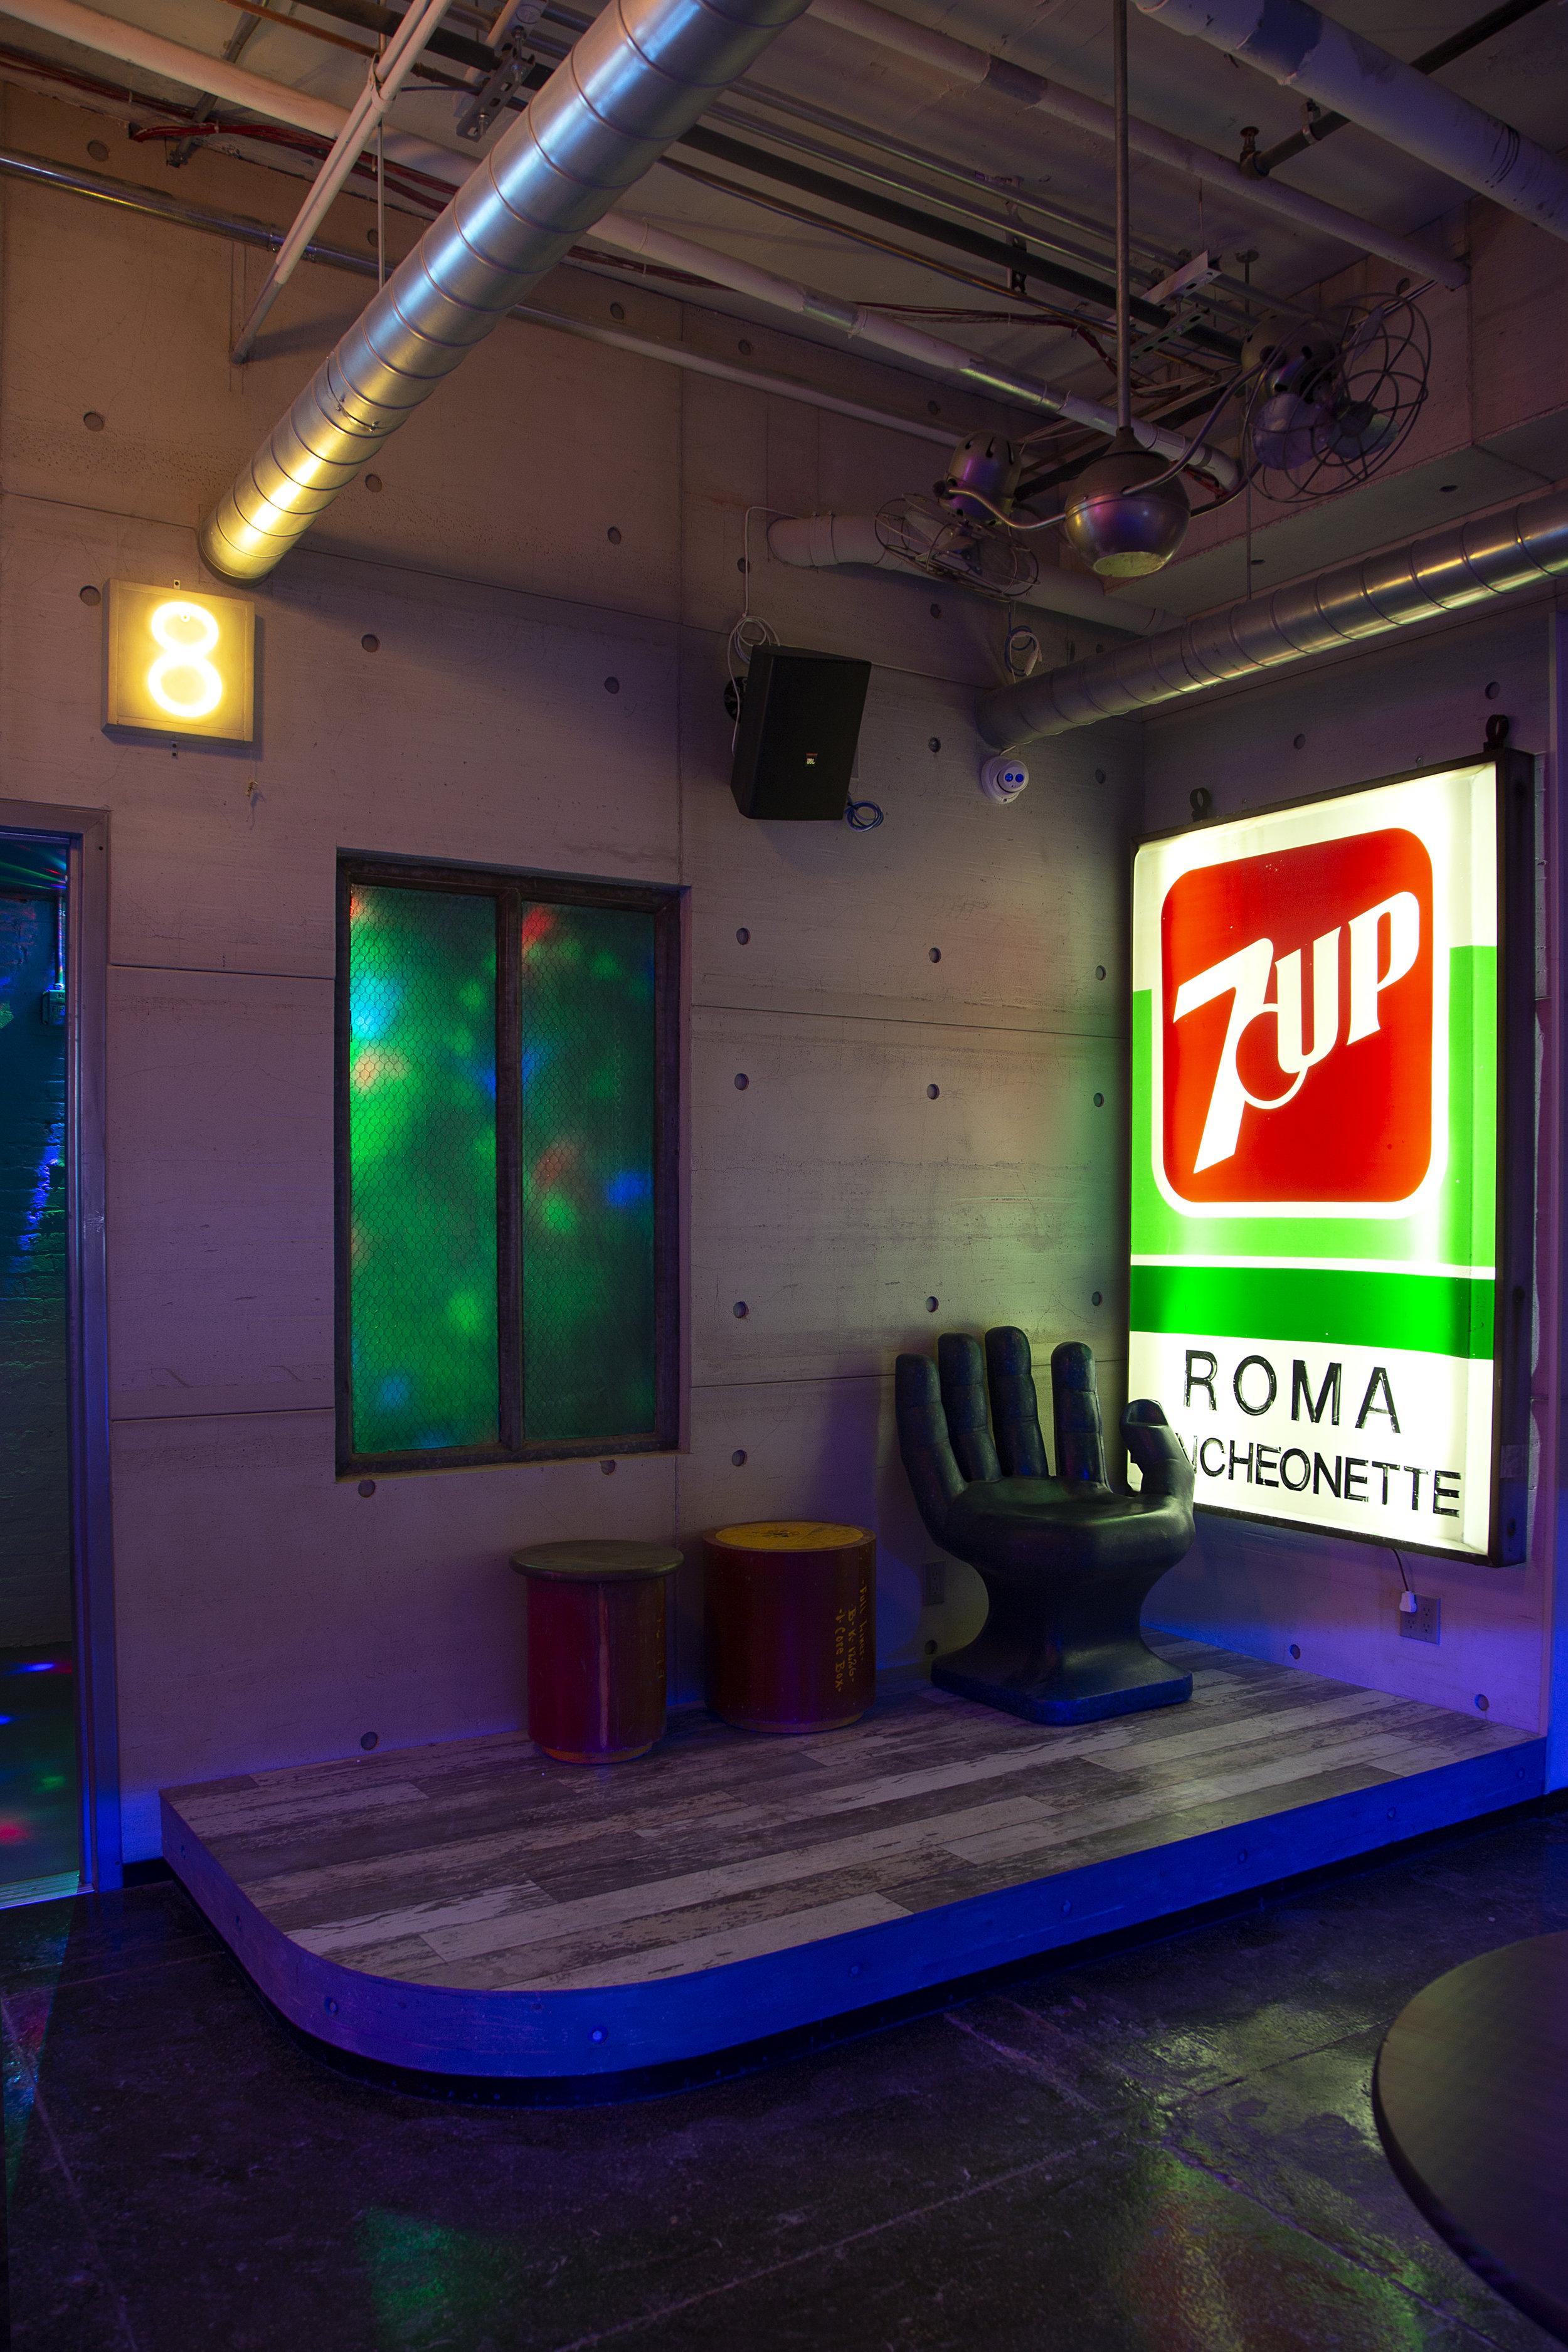 RPM-46.jpg